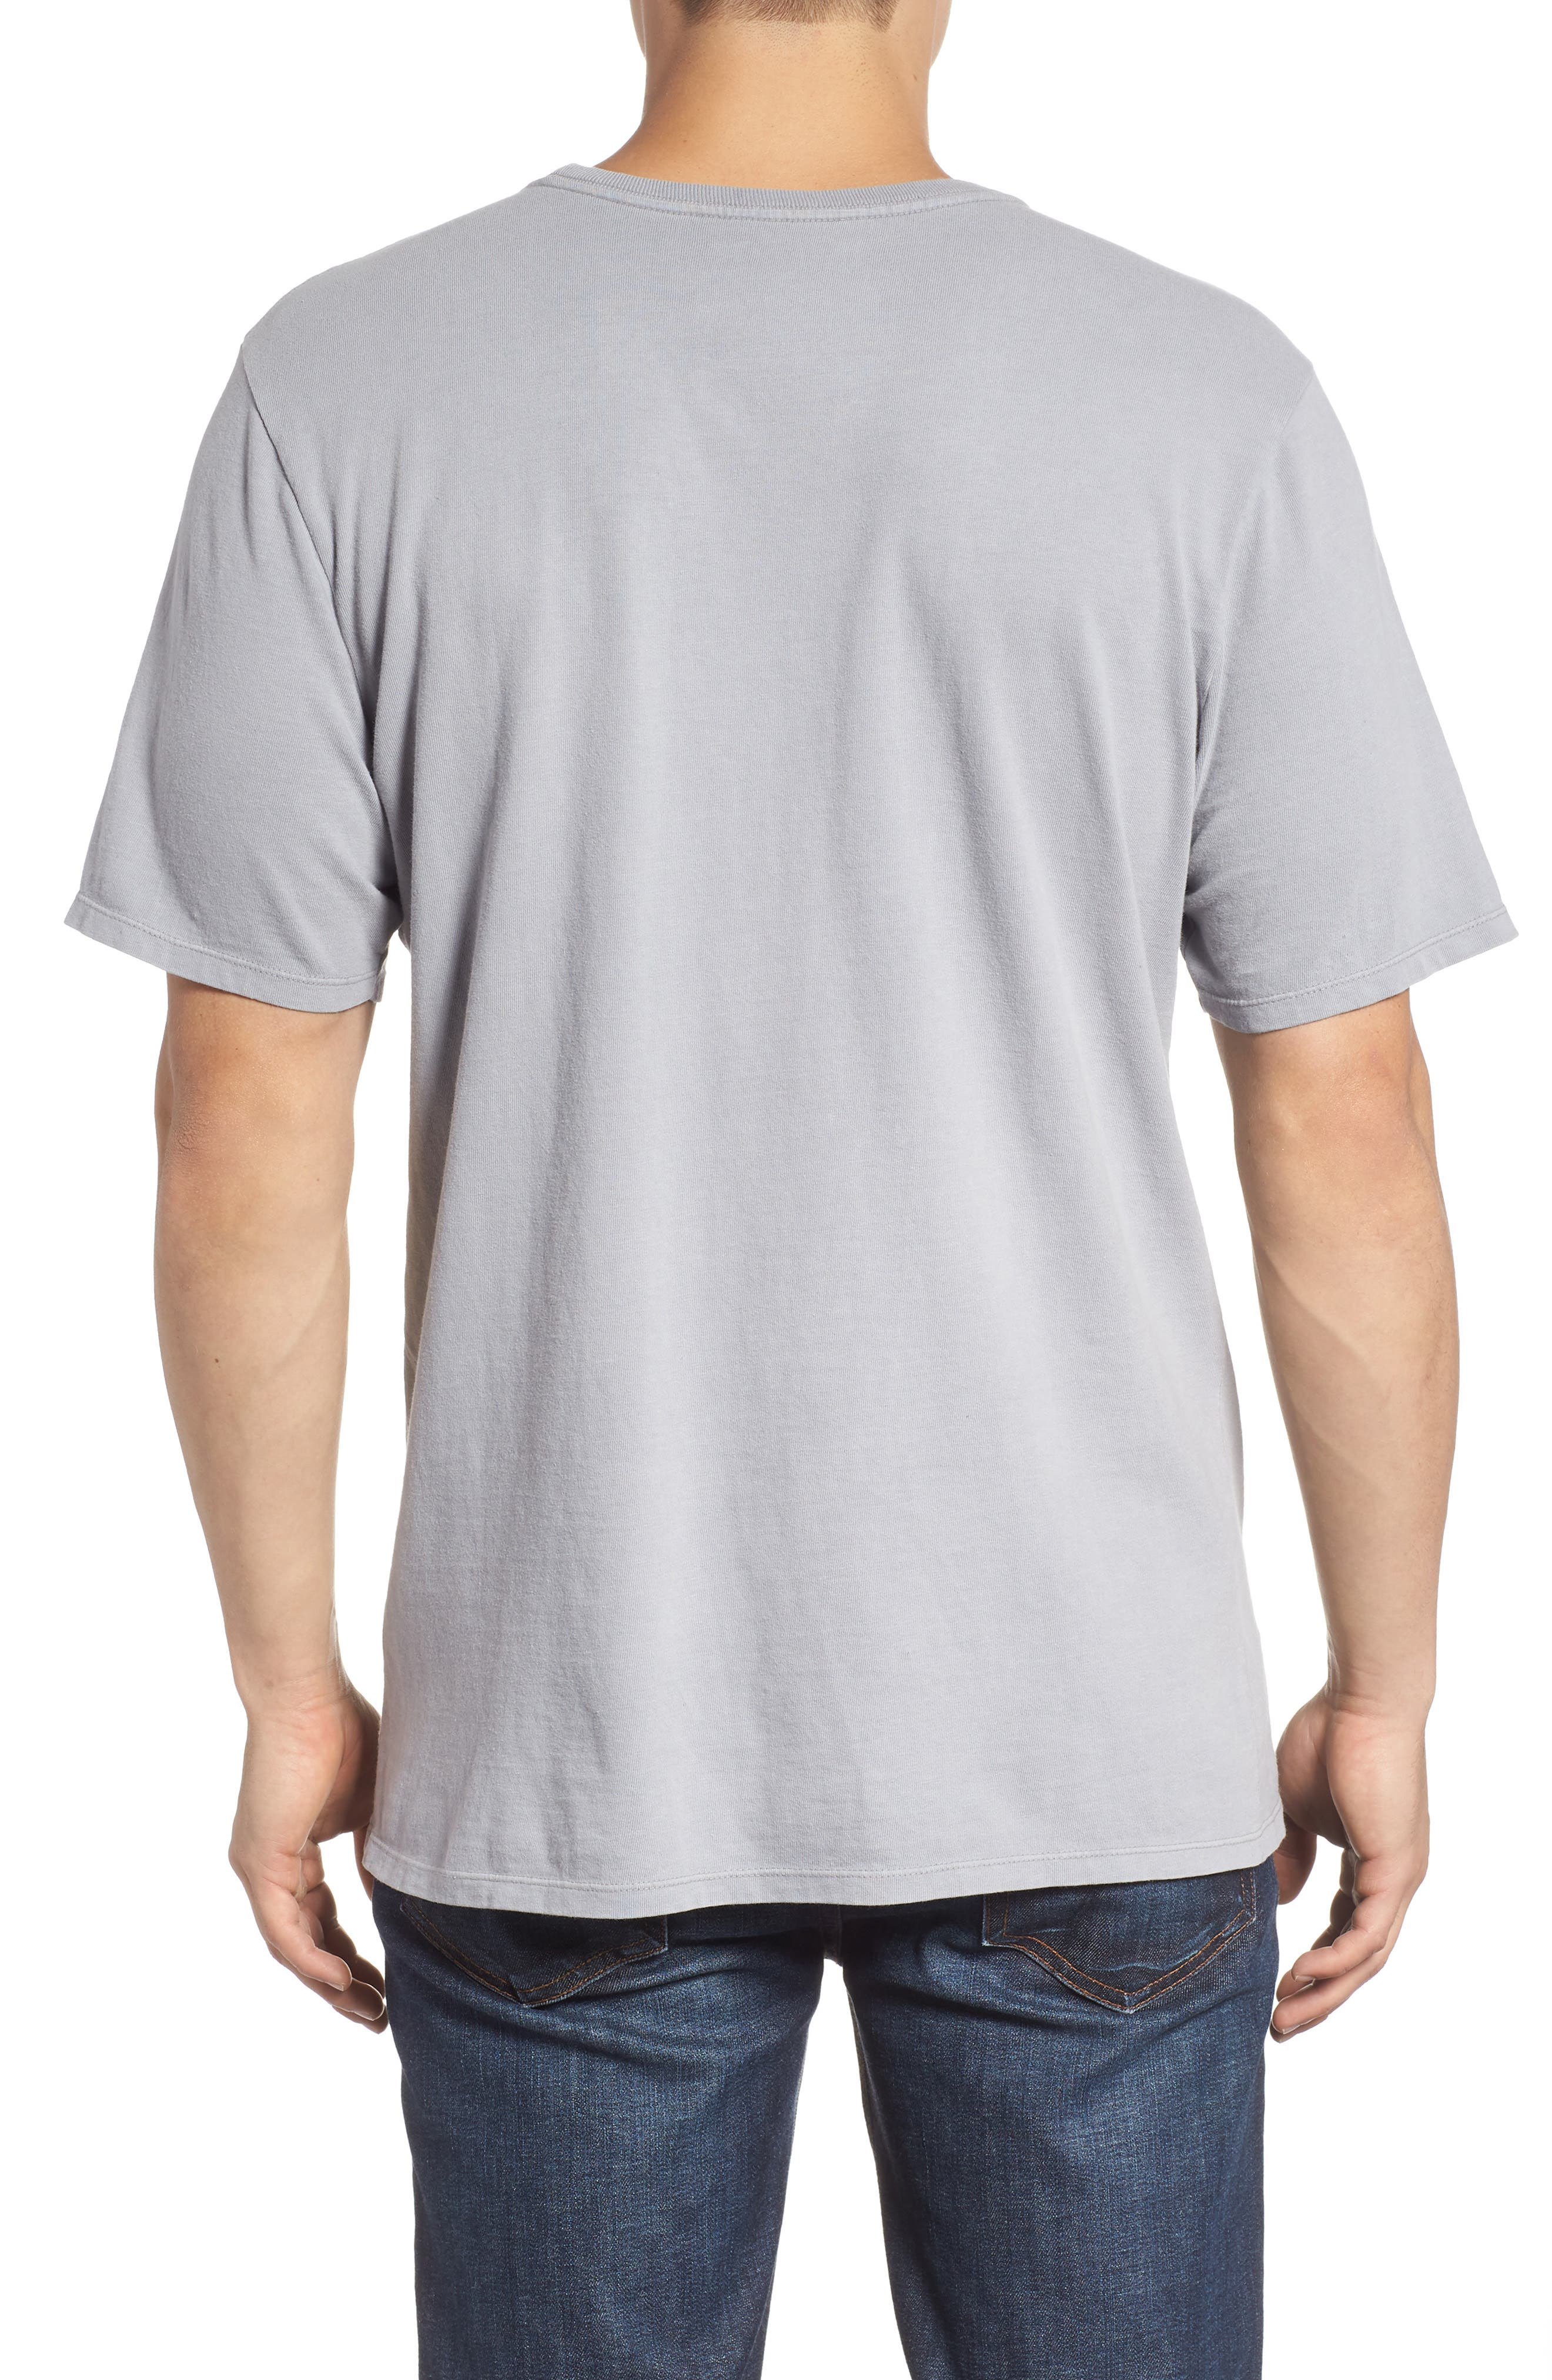 Sundown Summer Graphic T-Shirt,                             Alternate thumbnail 2, color,                             020